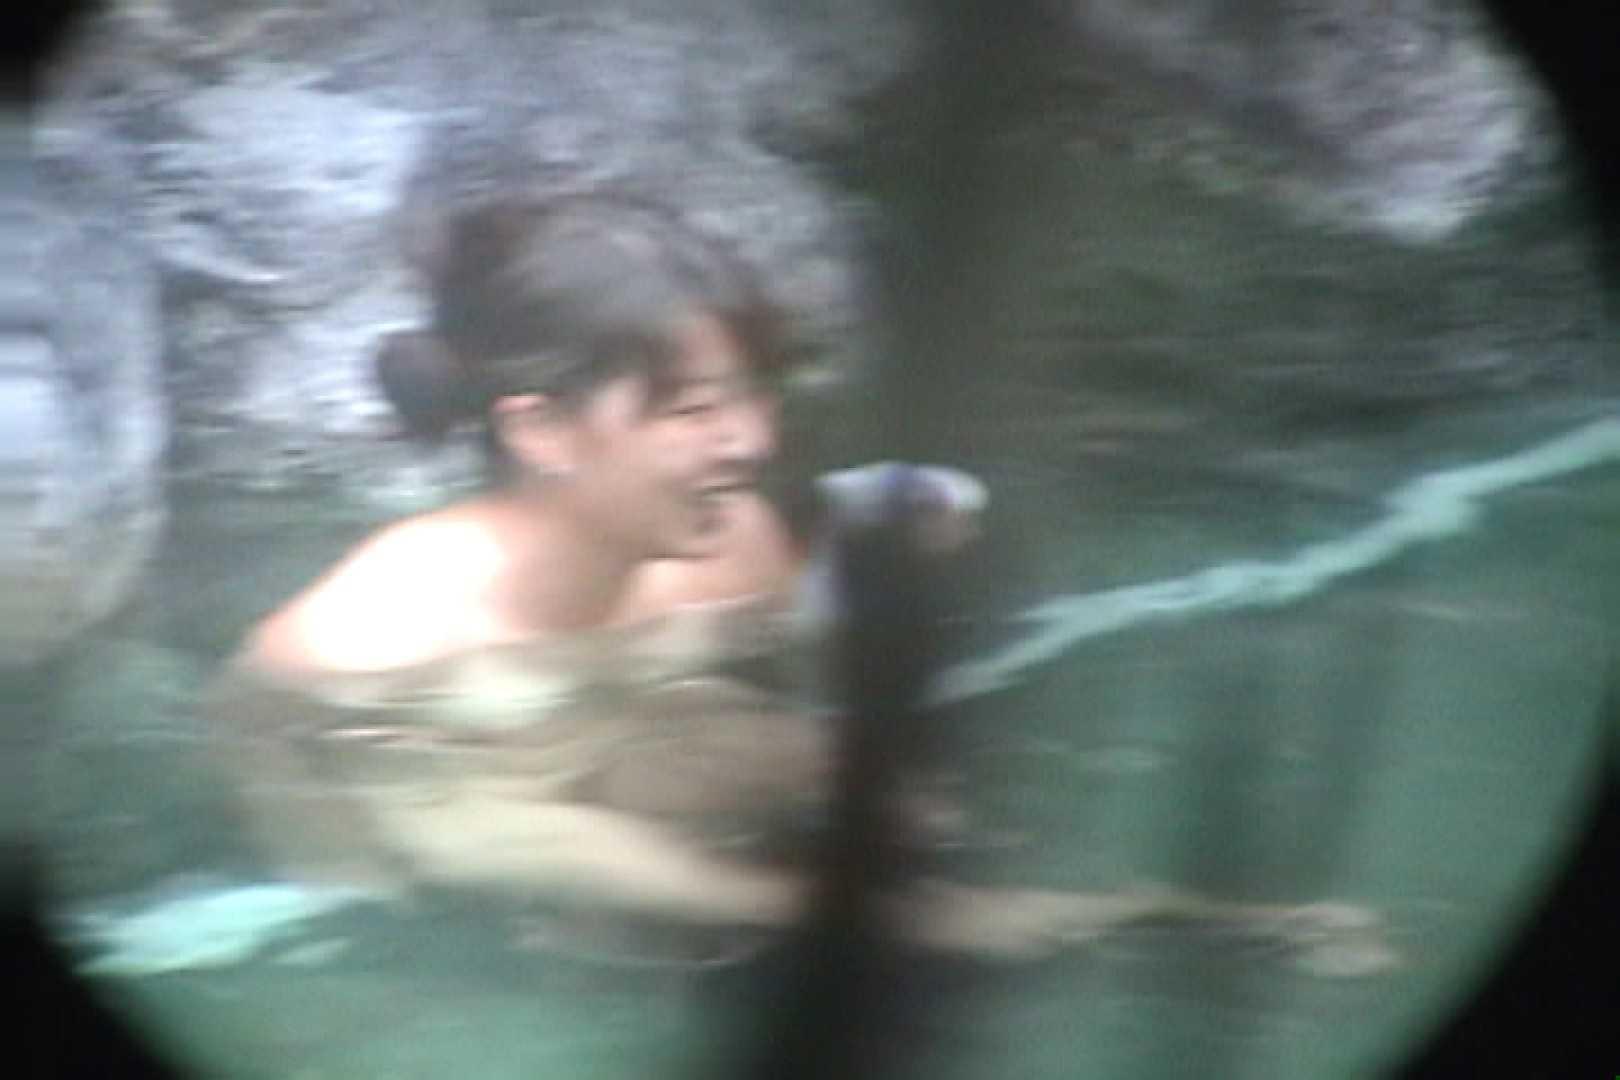 Aquaな露天風呂Vol.69【VIP限定】 盗撮 アダルト動画キャプチャ 106連発 29